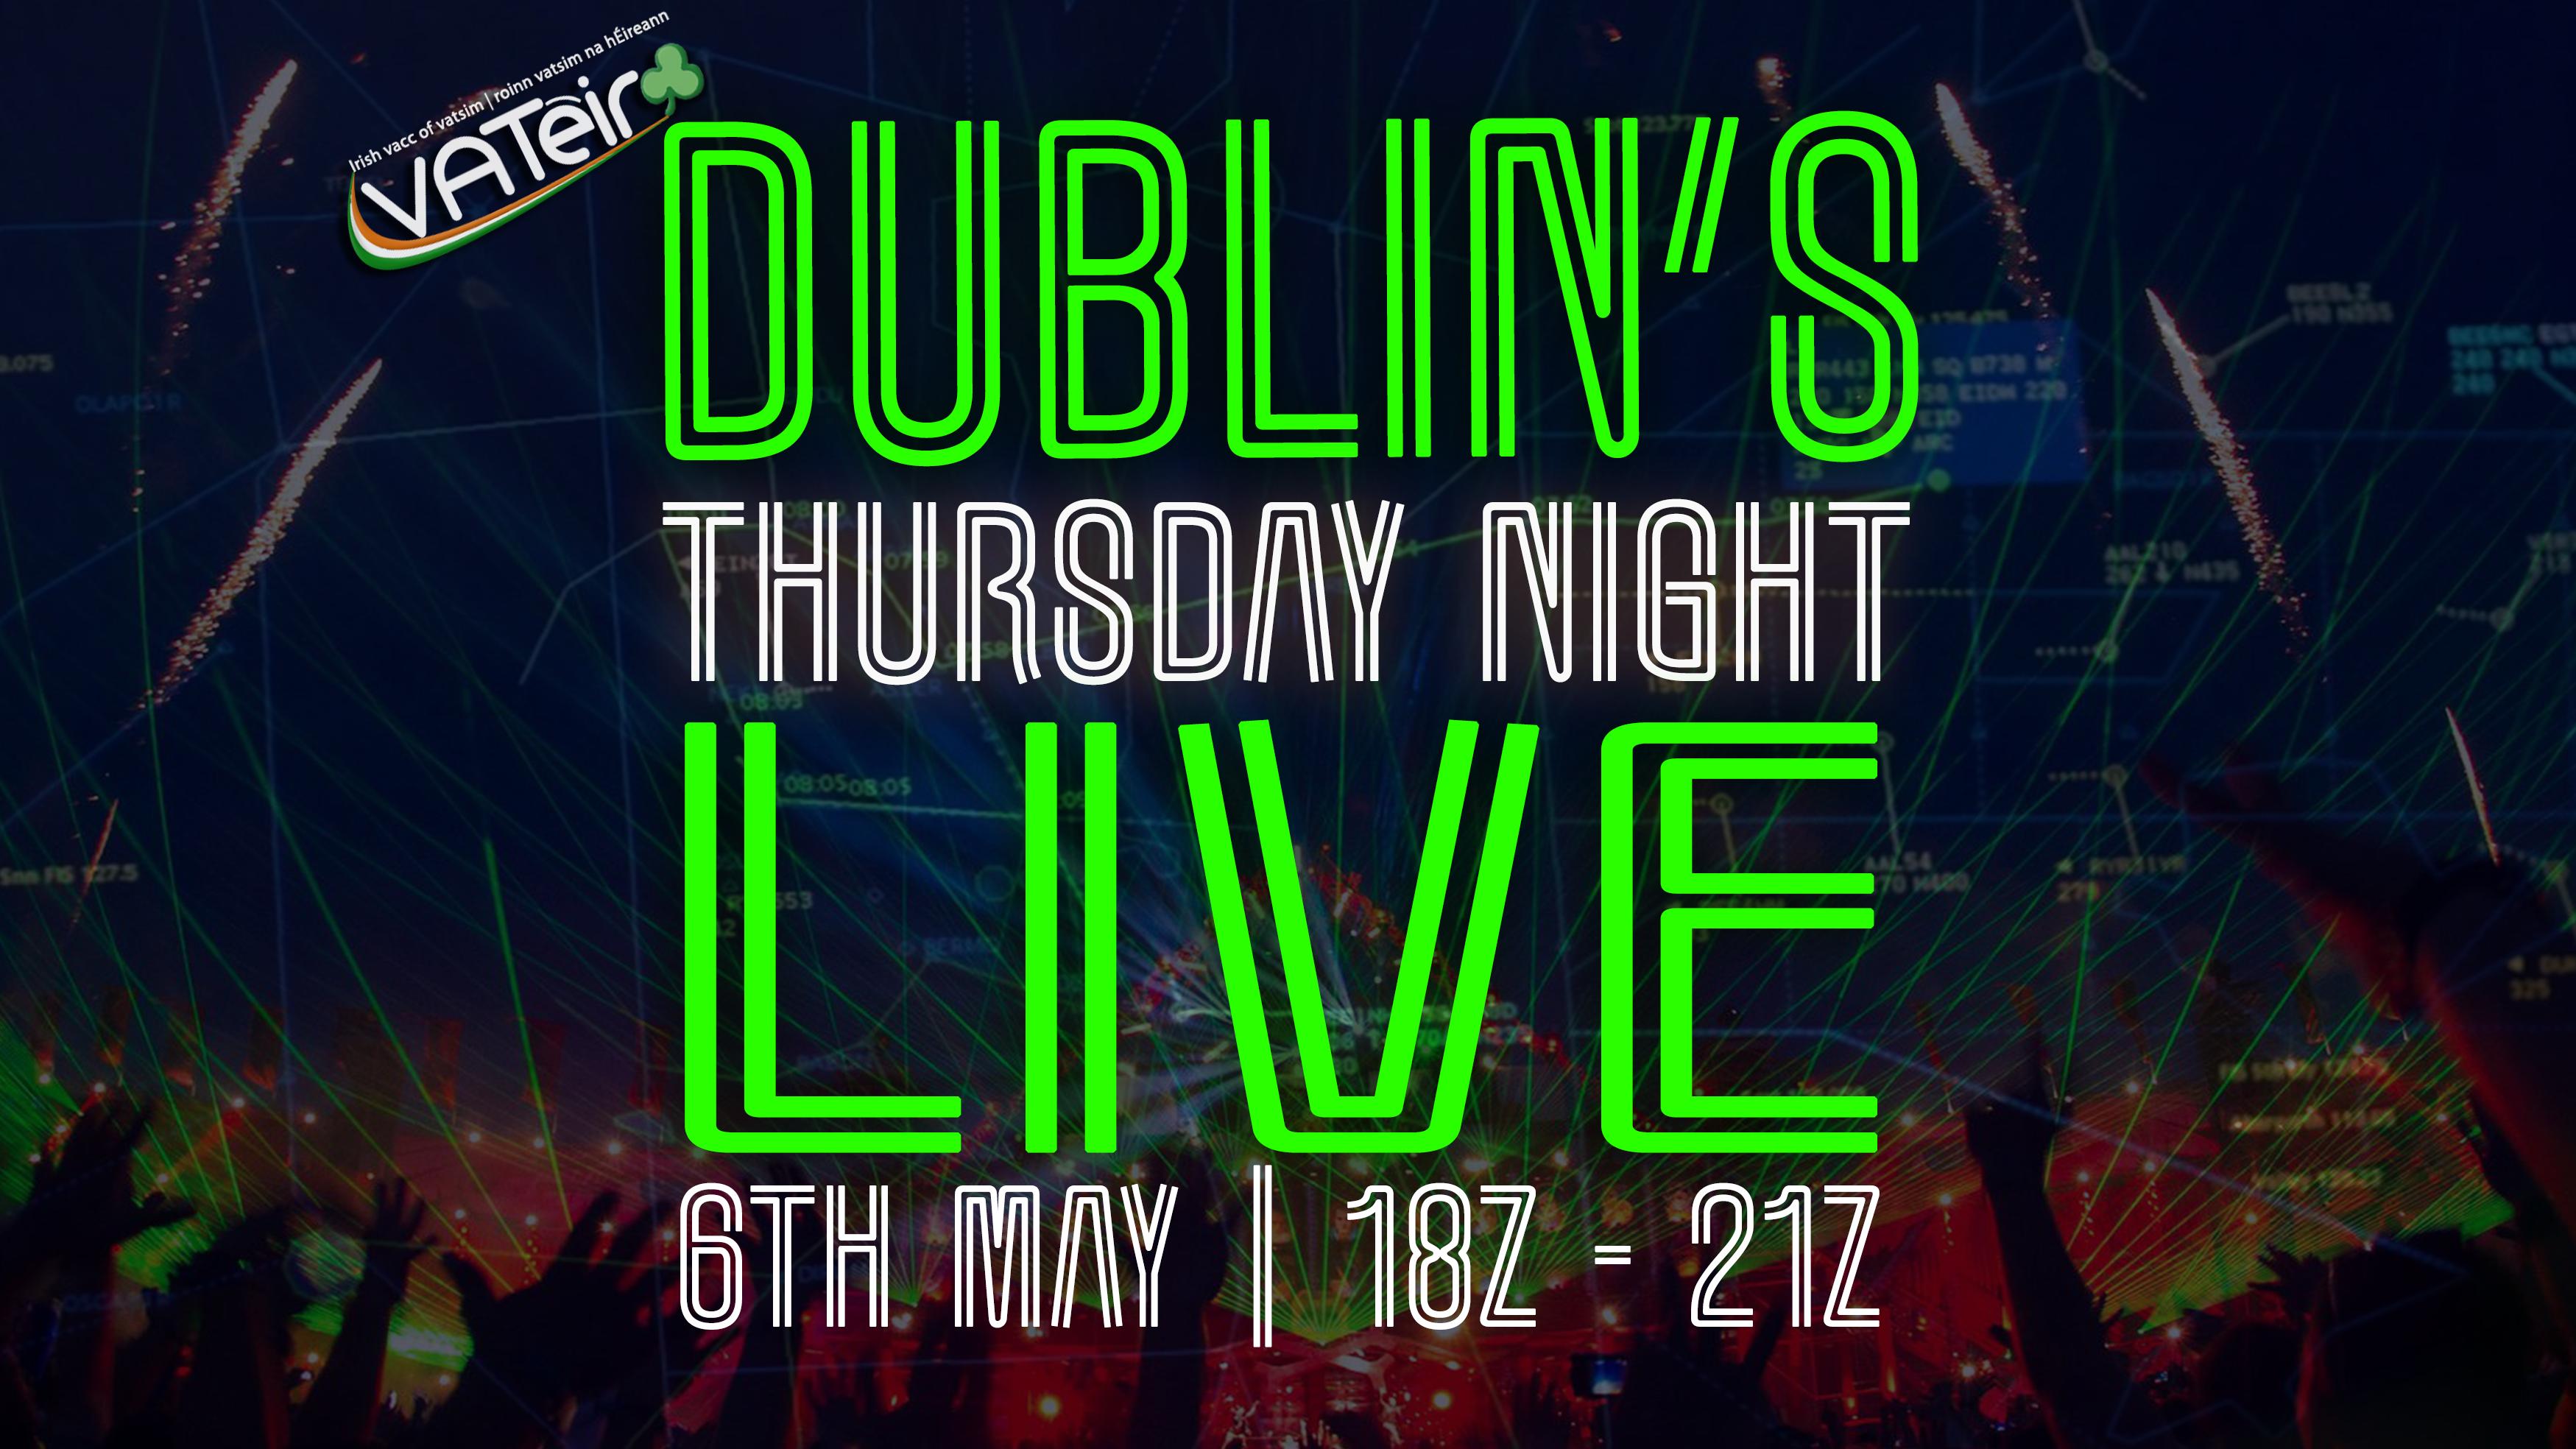 Dublins Thursday Night Live - Virtual Norwegian Events